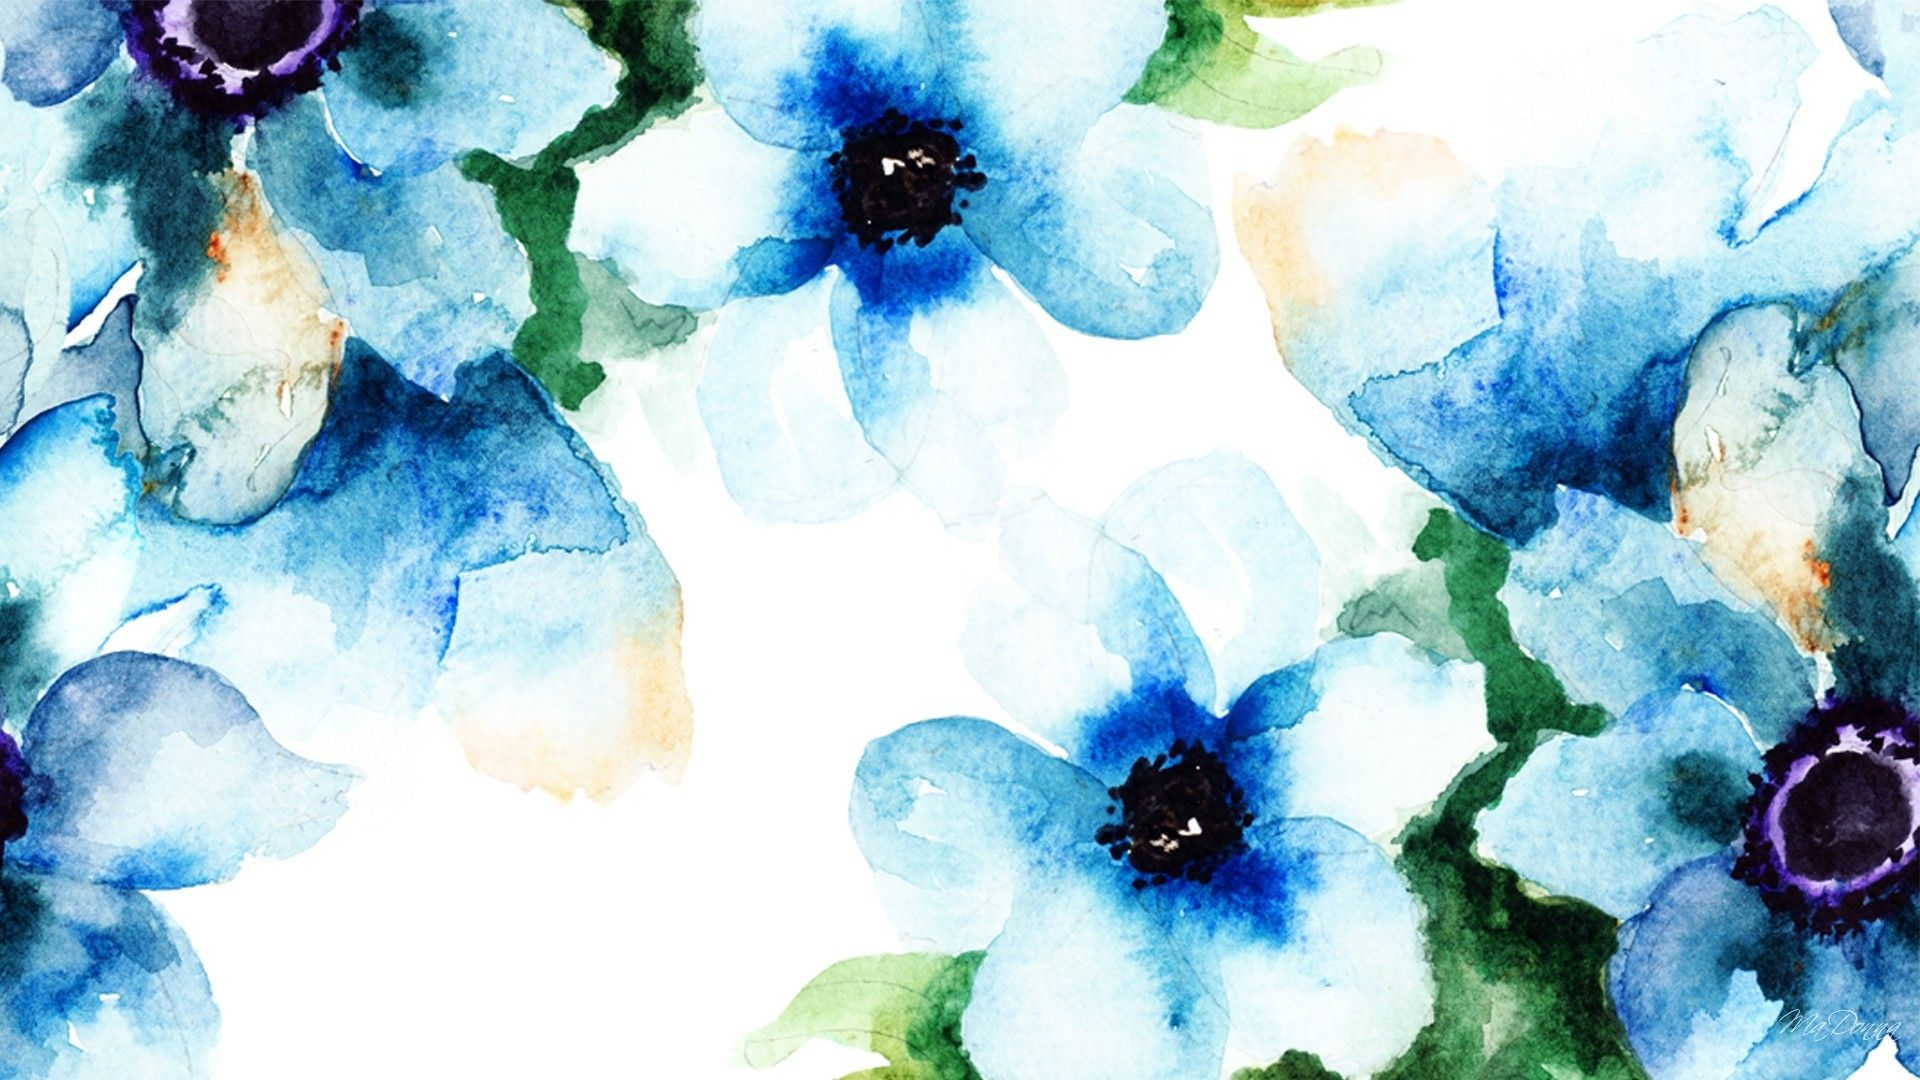 flowersbrushedblueswatercolorsummerabstractspring